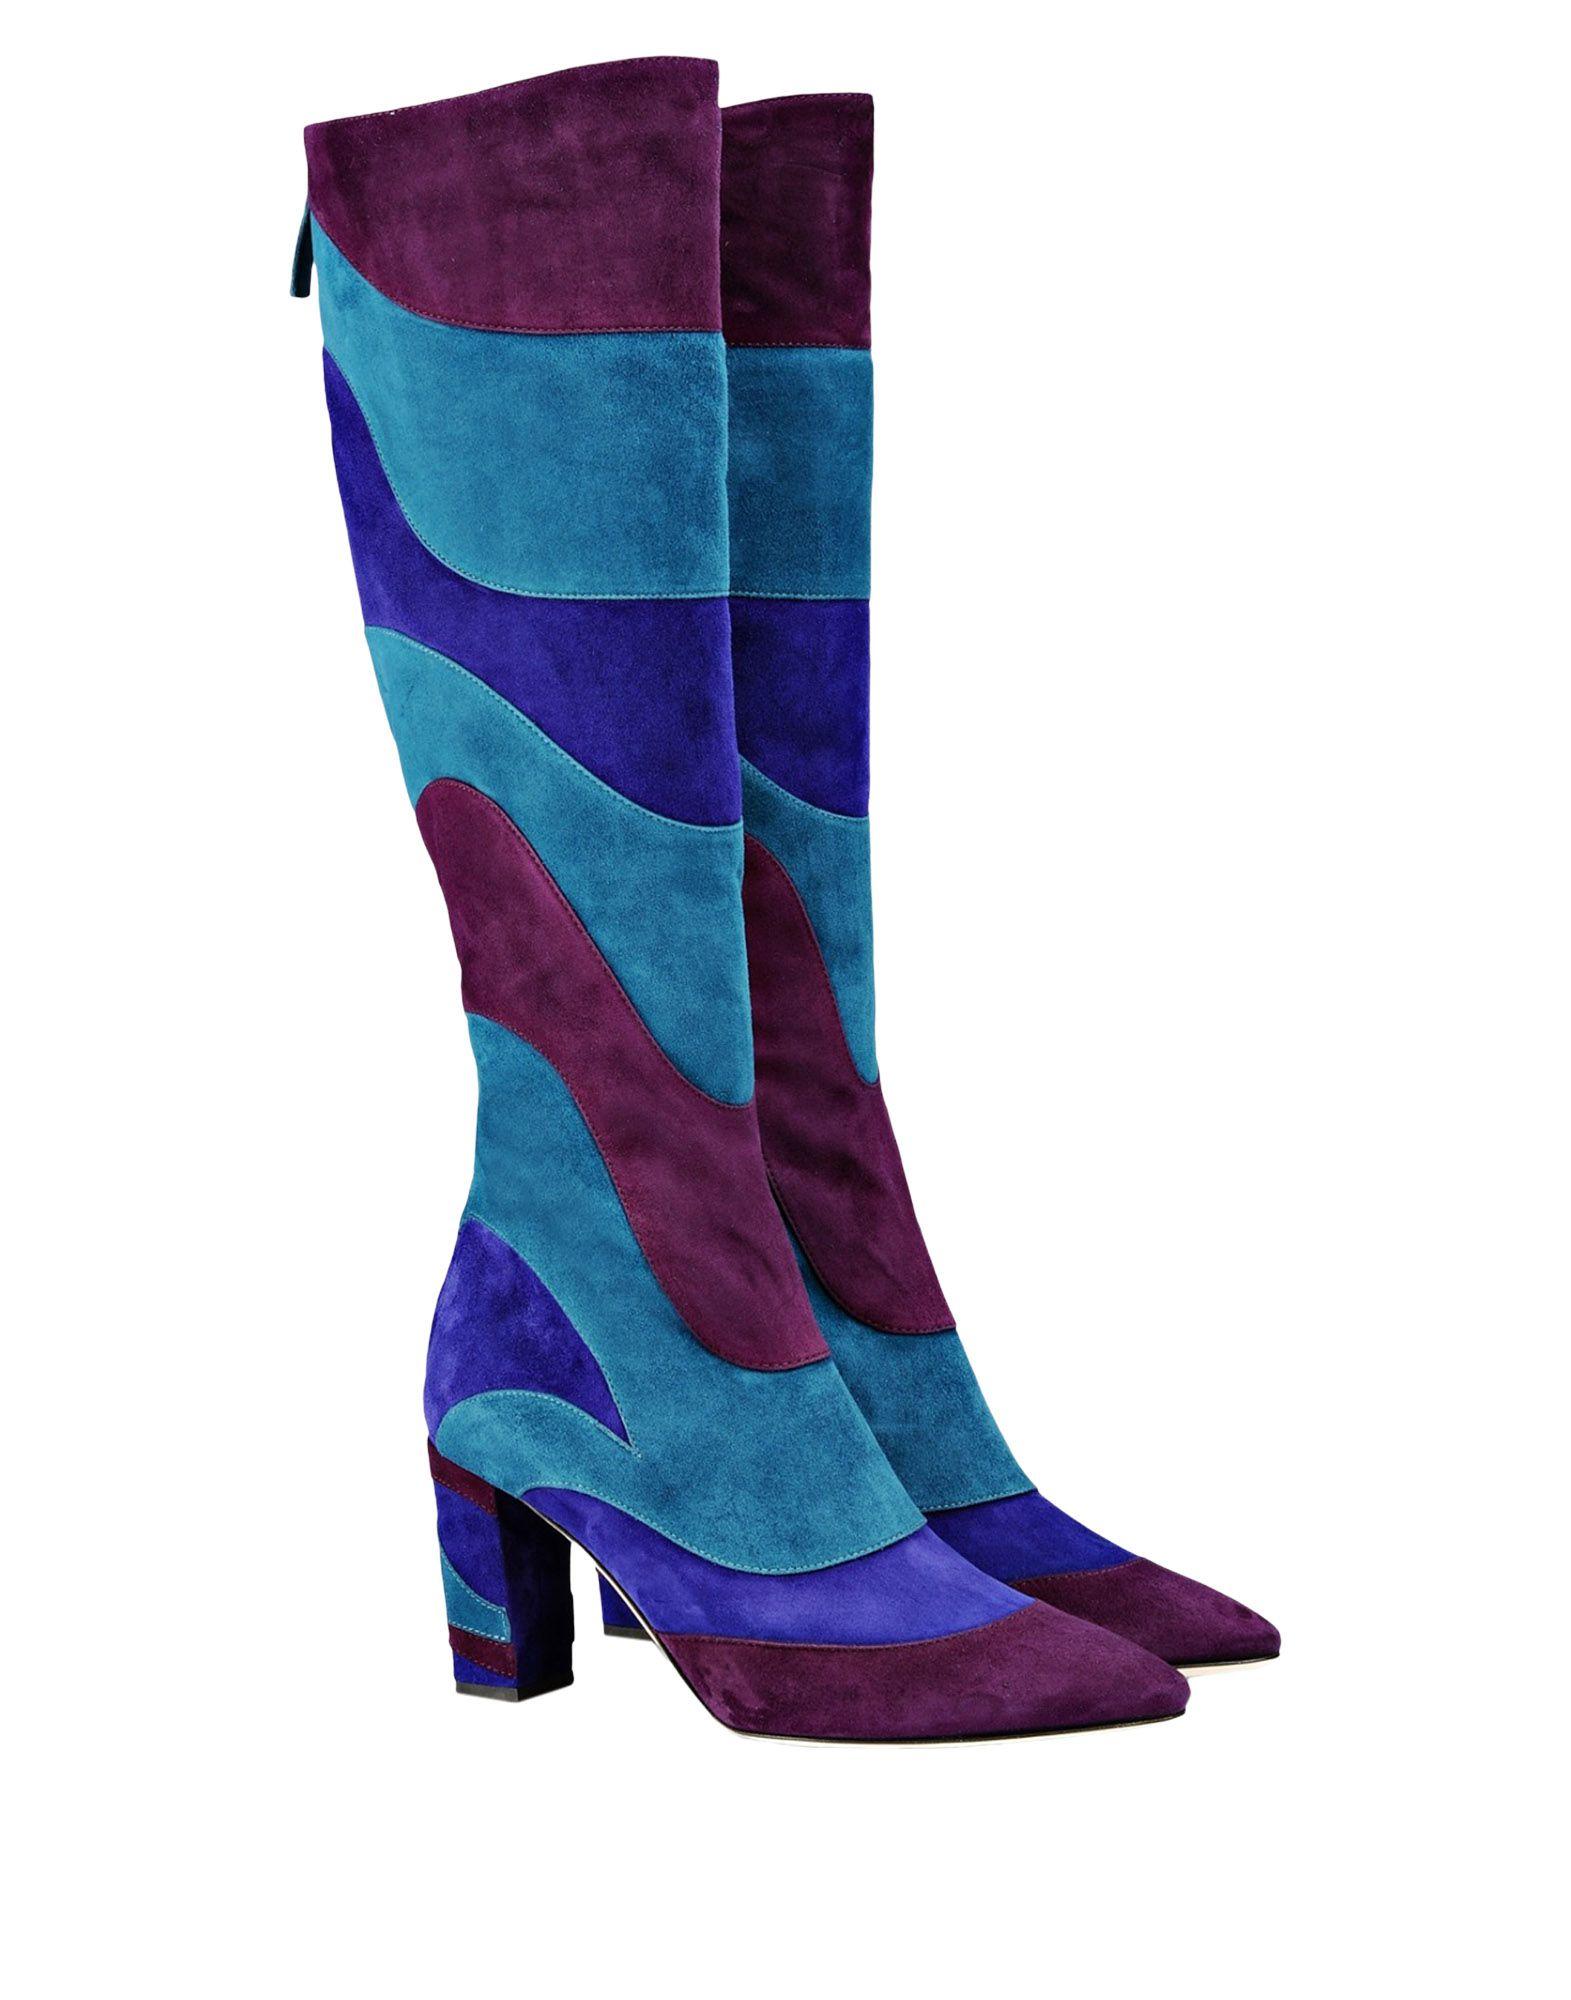 Alberta Ferretti Boots - Women Alberta Ferretti Boots - online on  Canada - Boots 11305718RJ 9265a7